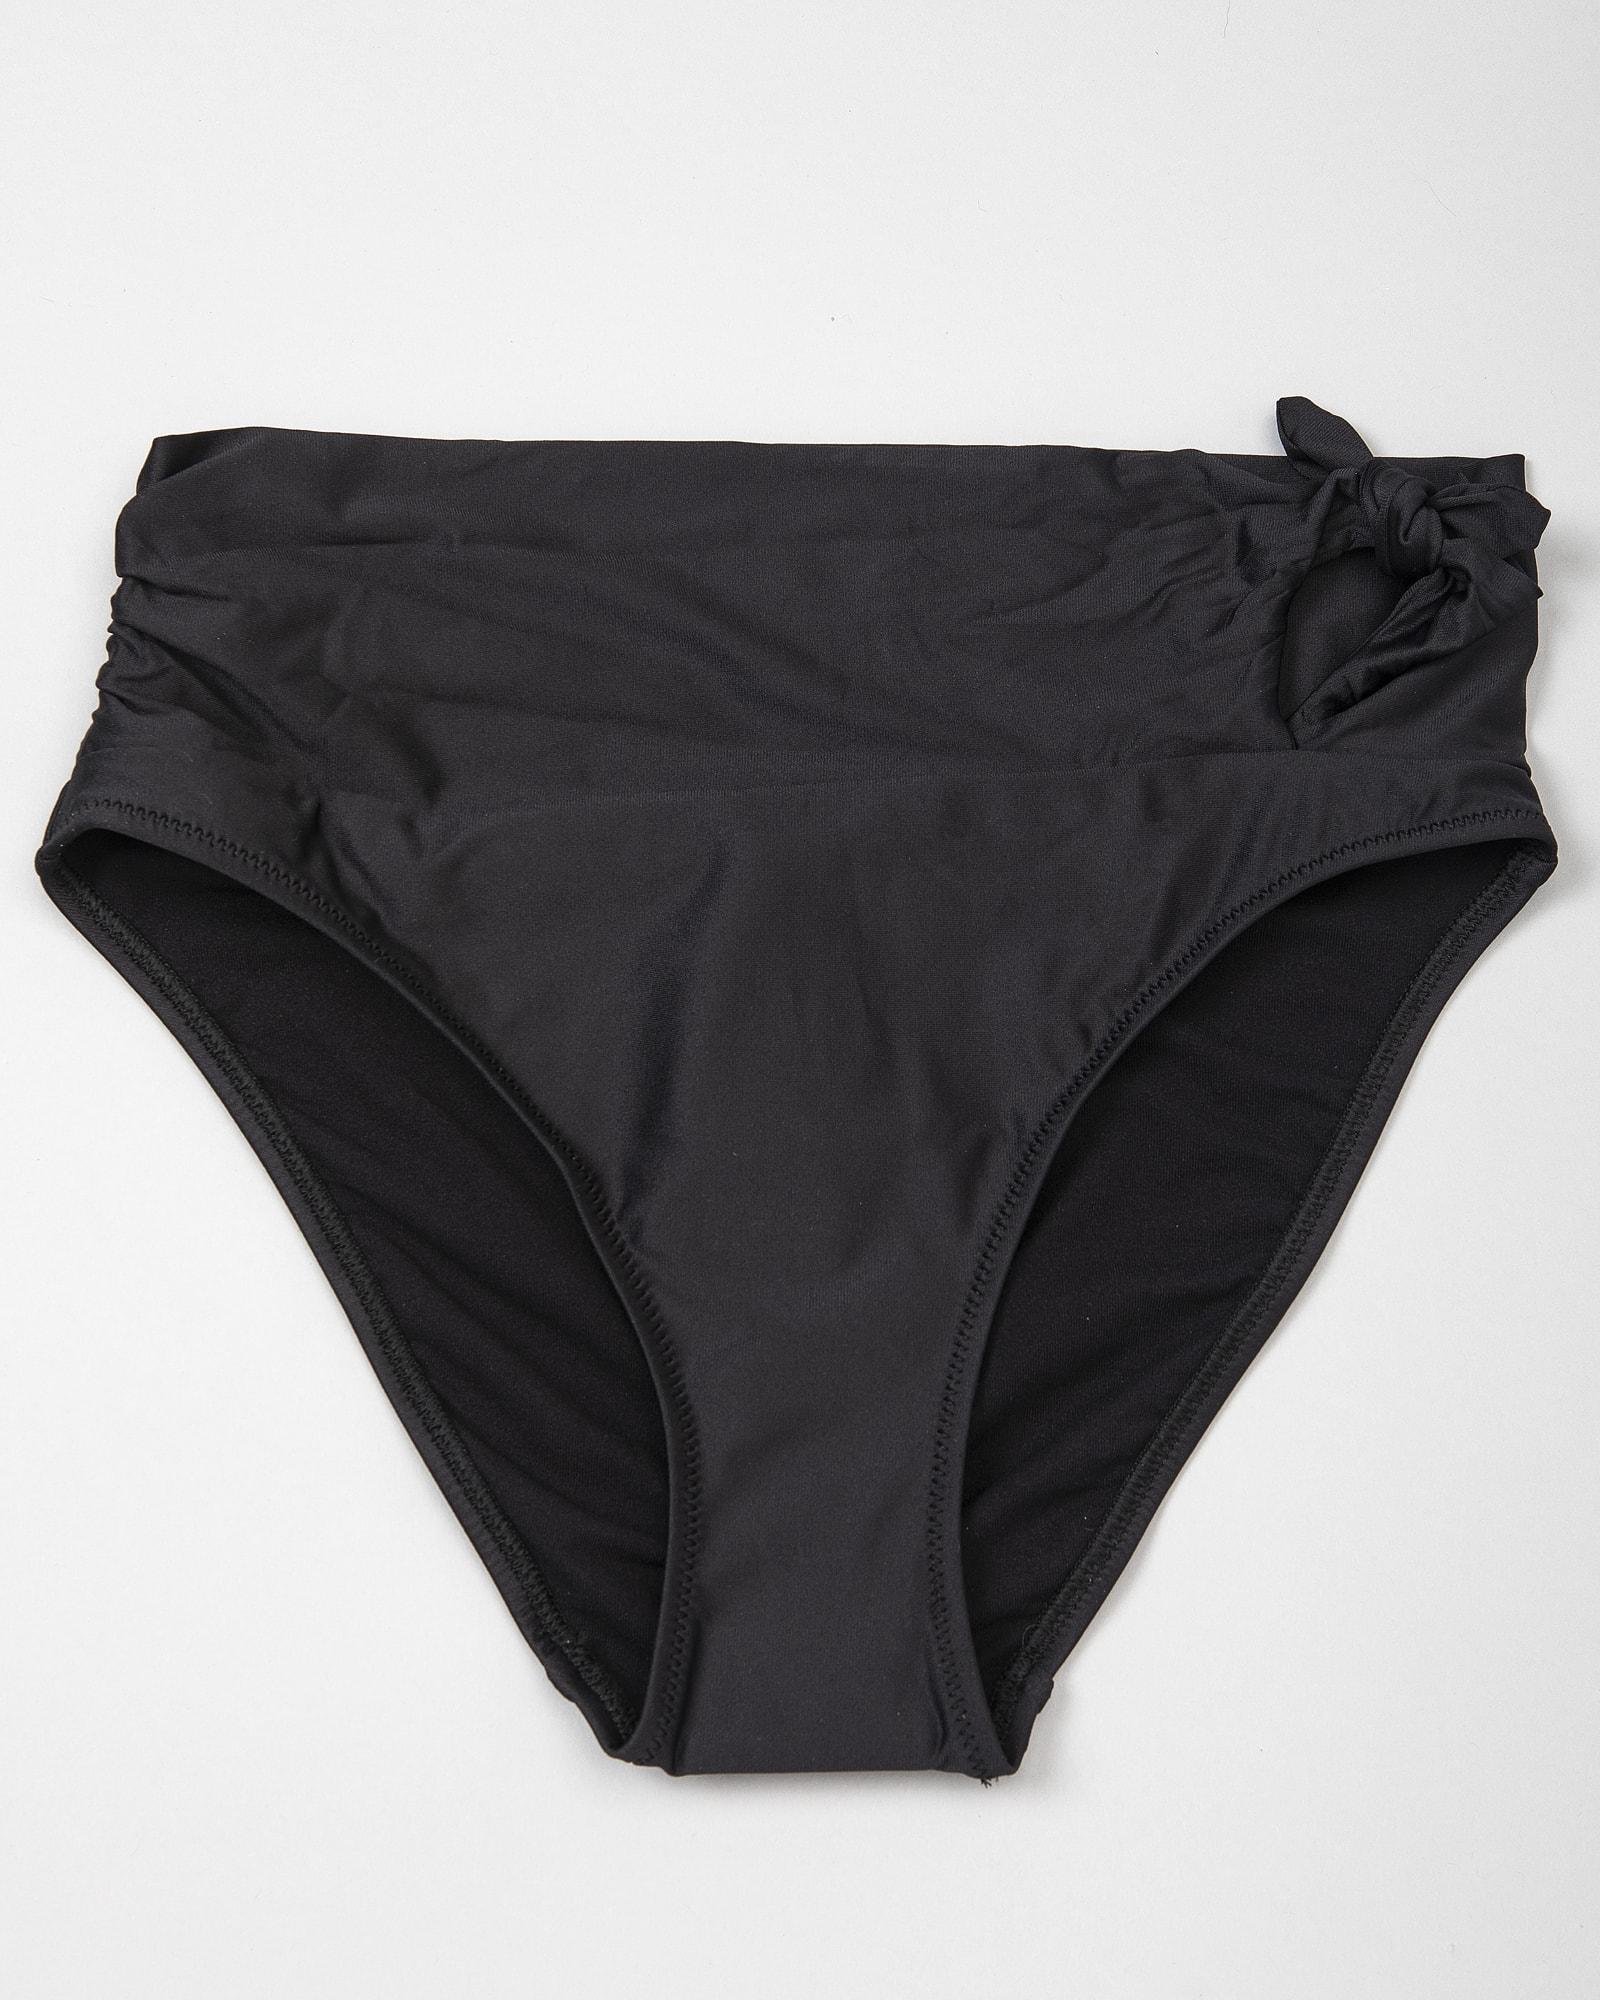 Antigel L'estivale Chic Bikini Bottom fba0316-0005 Black e